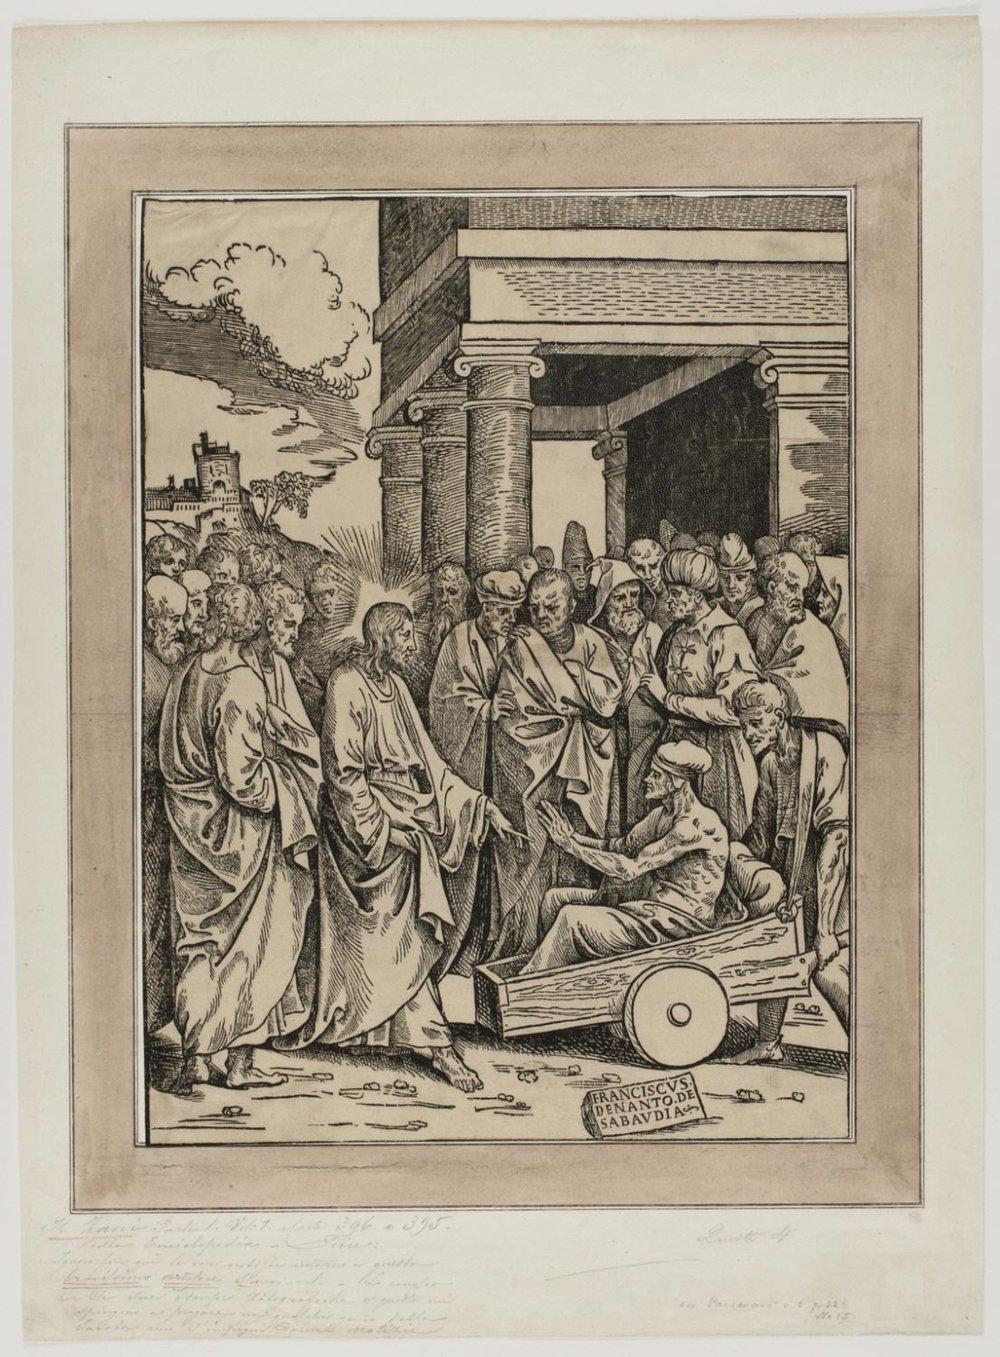 Christ Healing the Paralytic  ,mid-16th Century, by Francesco de Nanto, Italian from the  Philadelphia Museum of Art